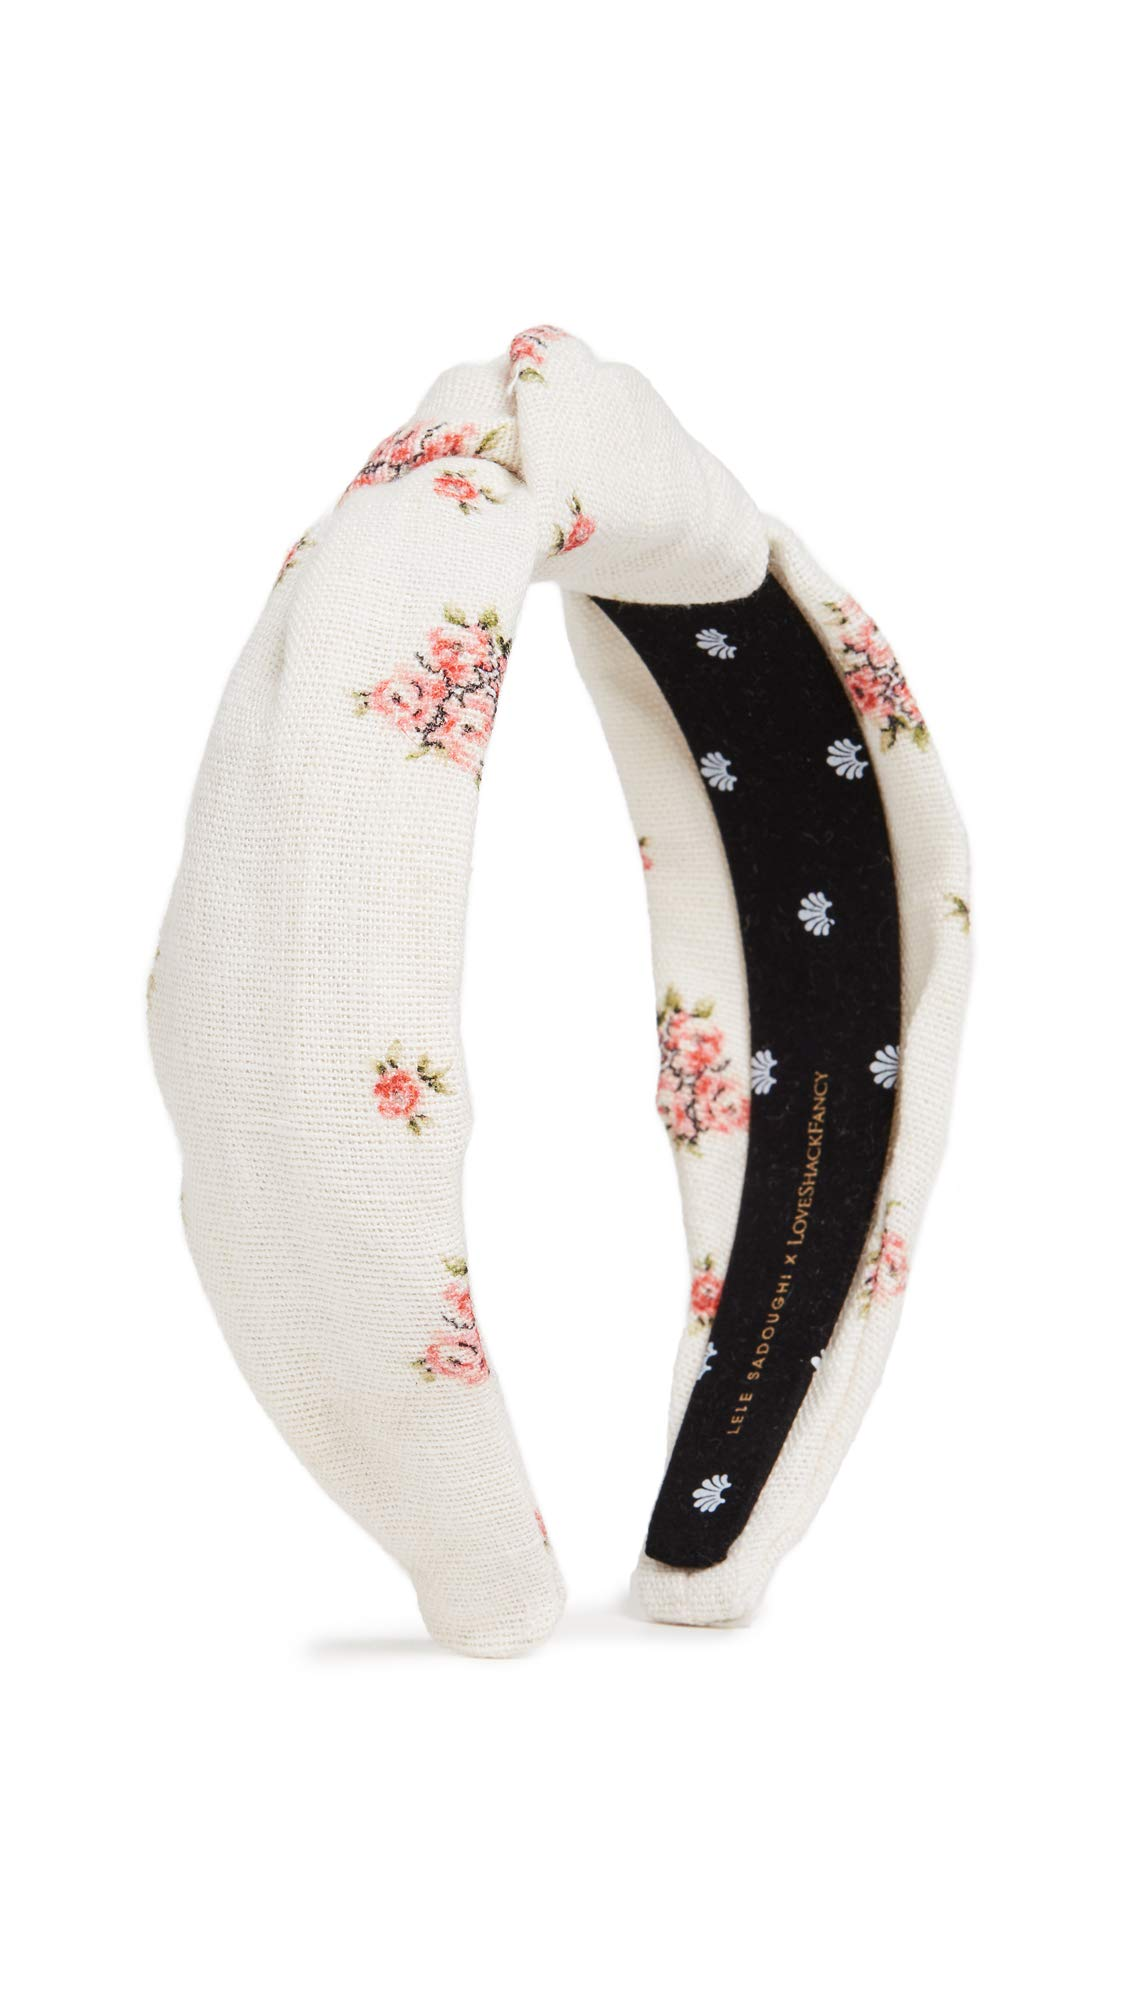 Lele Sadoughi Women's x Loveshackfancy Headband, French Cream, Off White, Floral, One Size